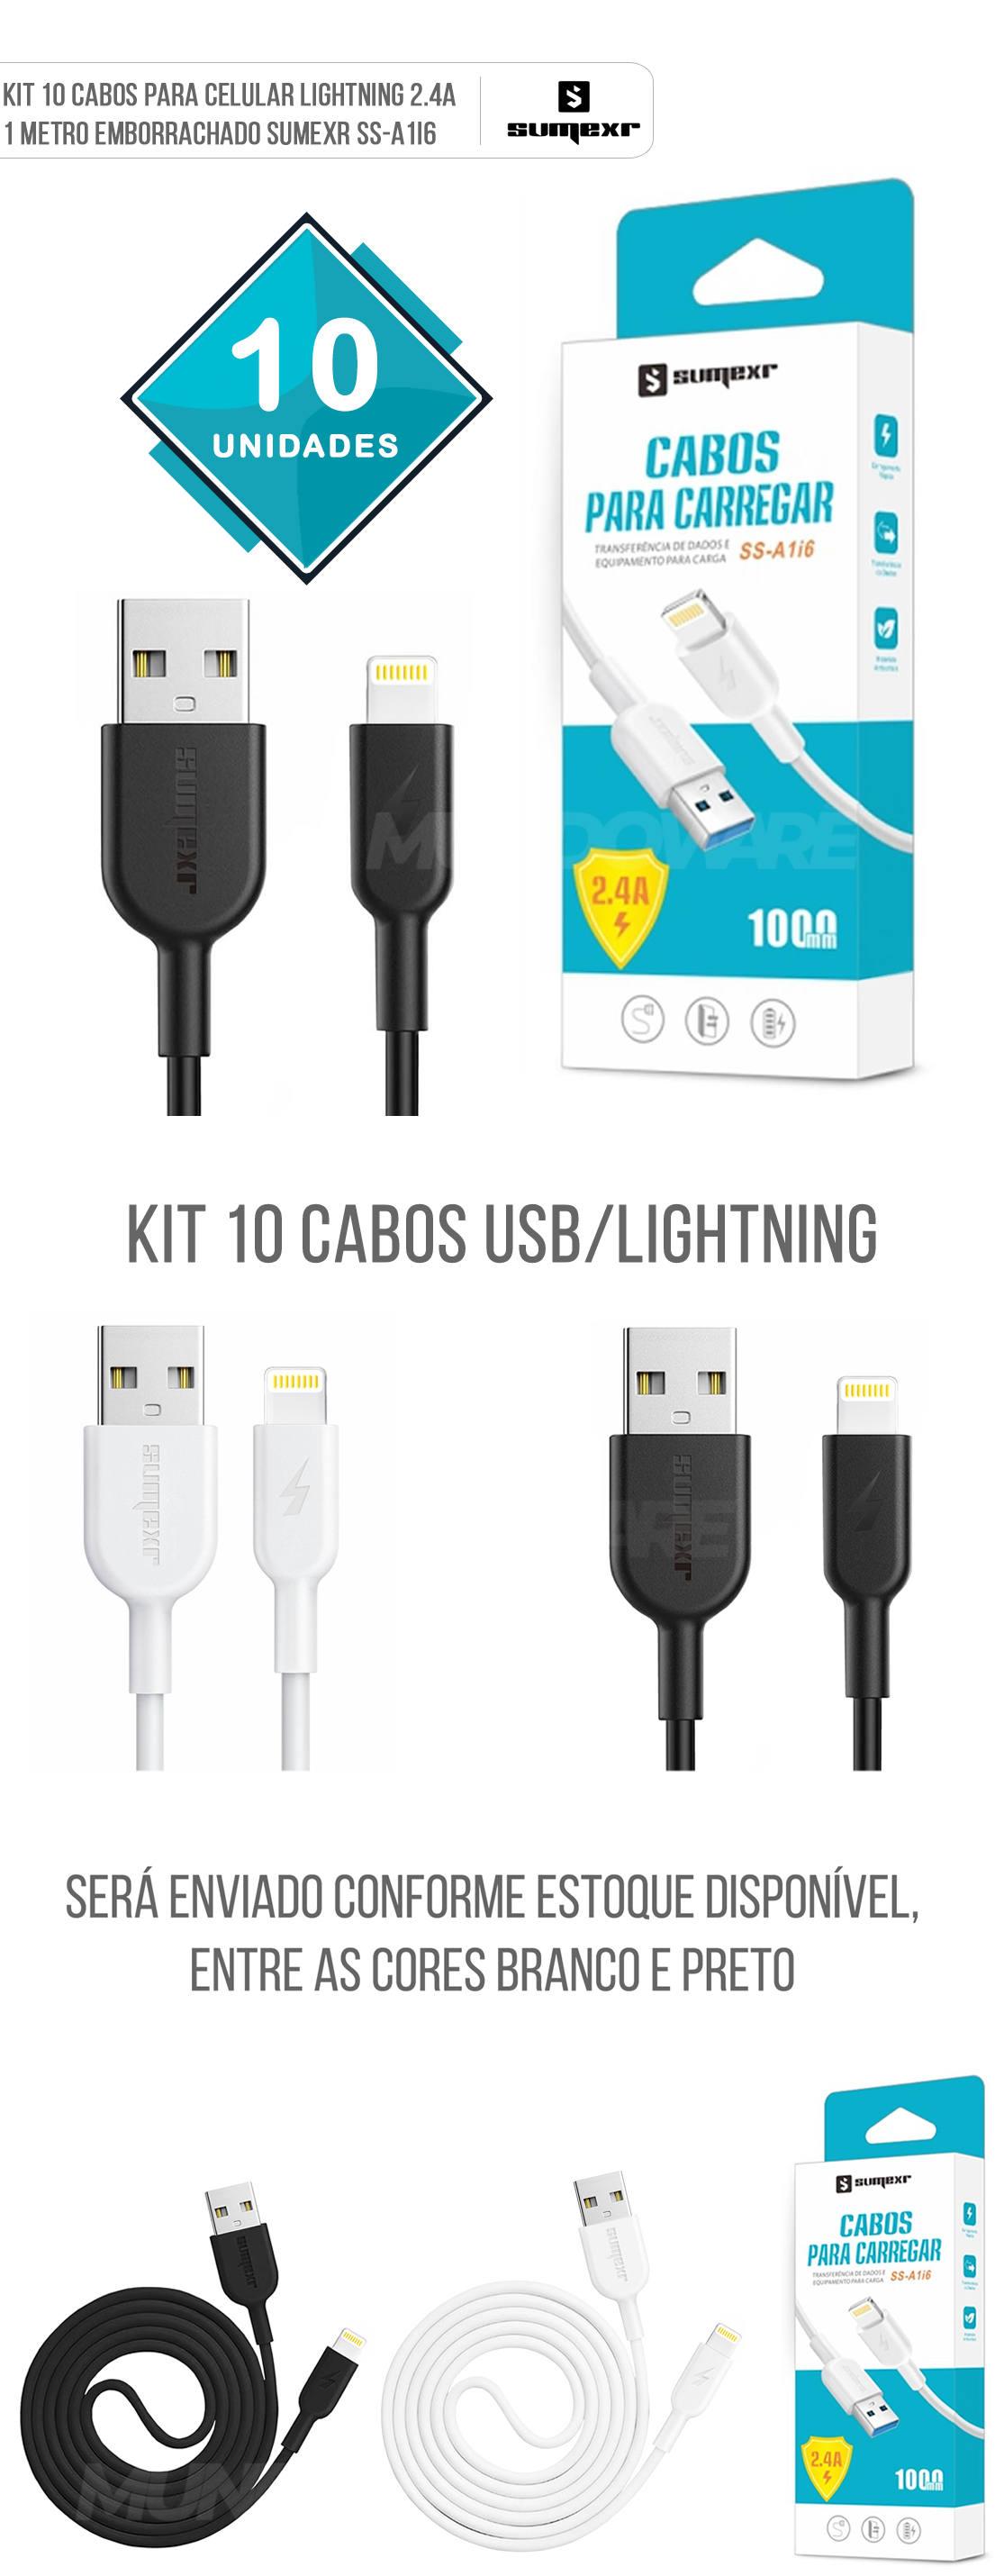 Kit 10x Cabo para iPhone Lightning 2.4A 1 Metro Emborrachado Sumexr SS-A1I6